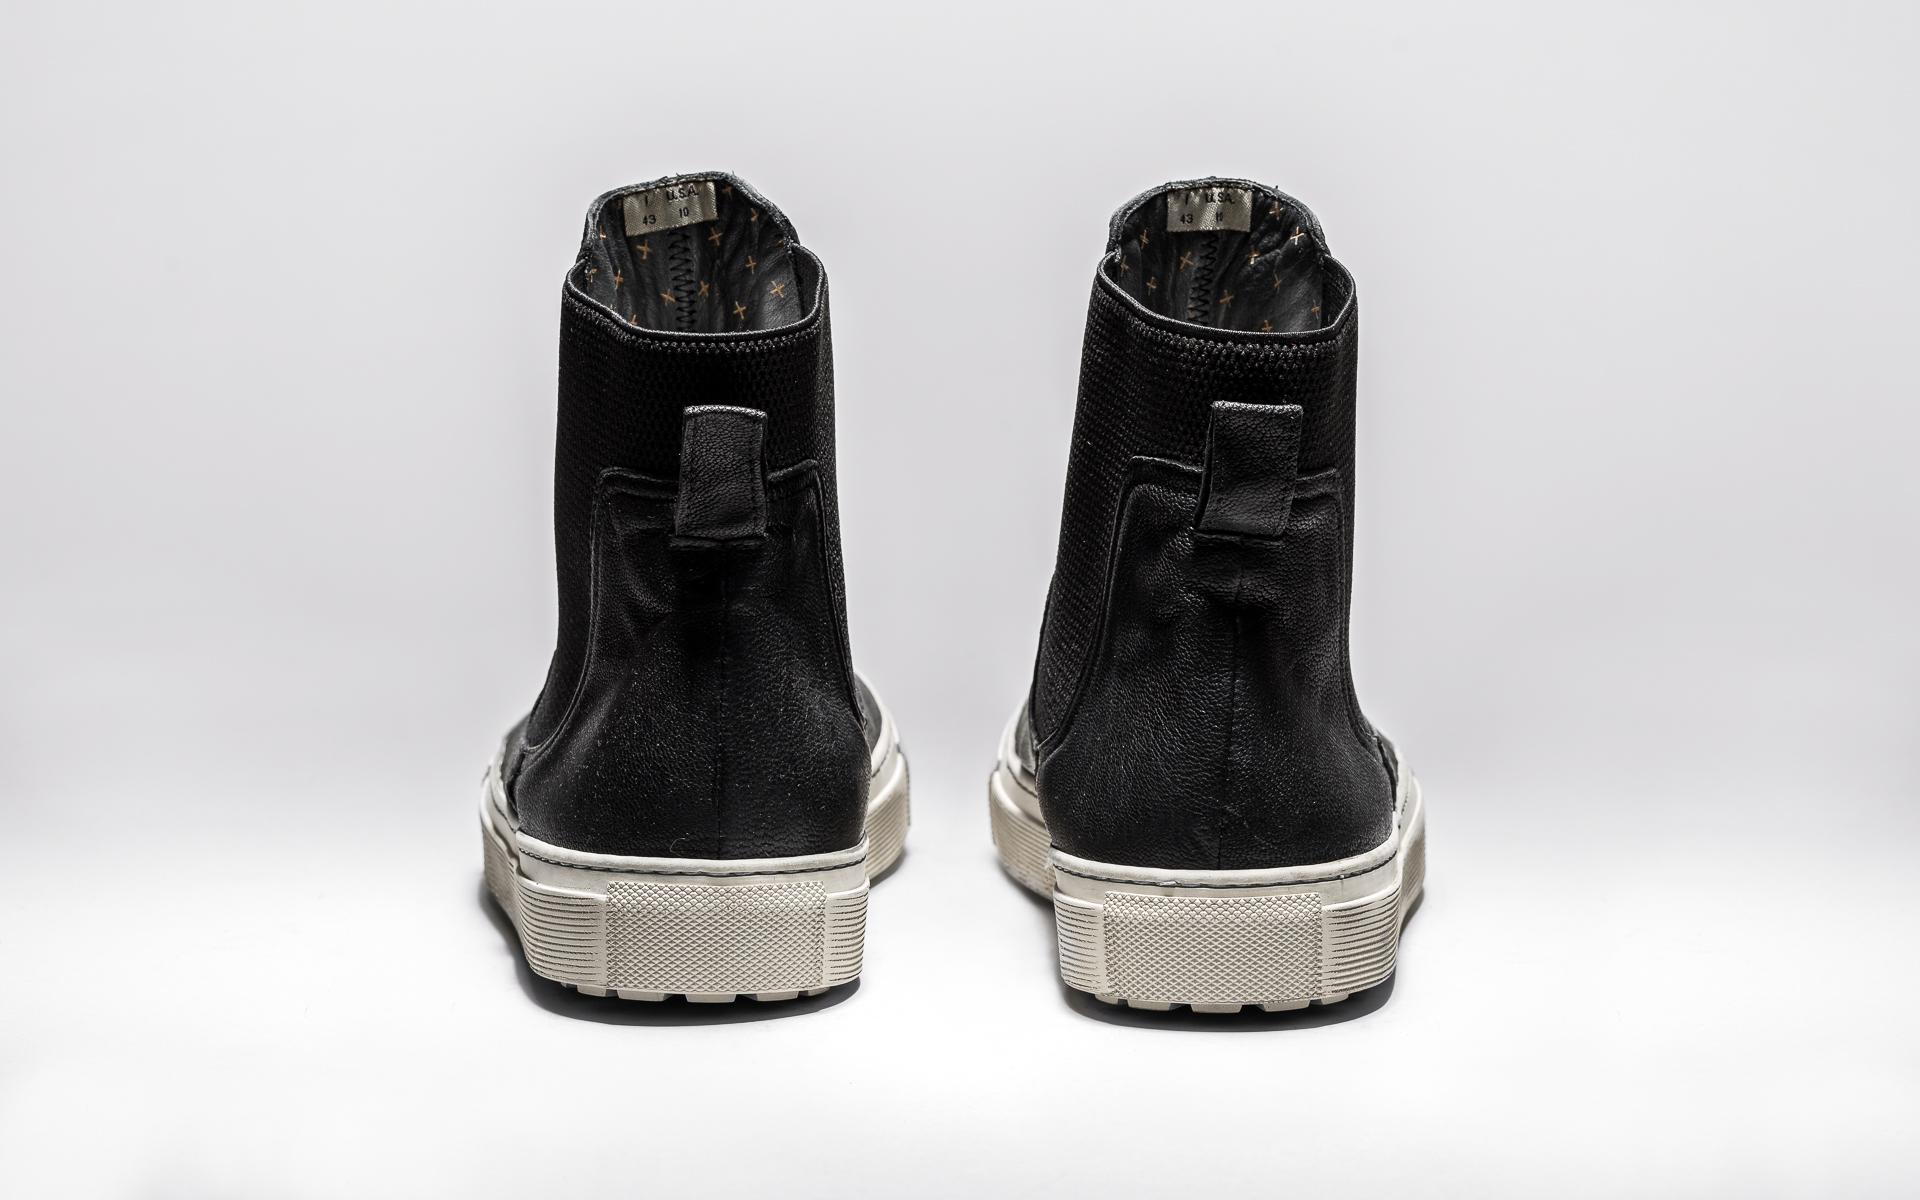 Bolt_Ban_Sneaker_Black_TexturedLeather-3.jpg